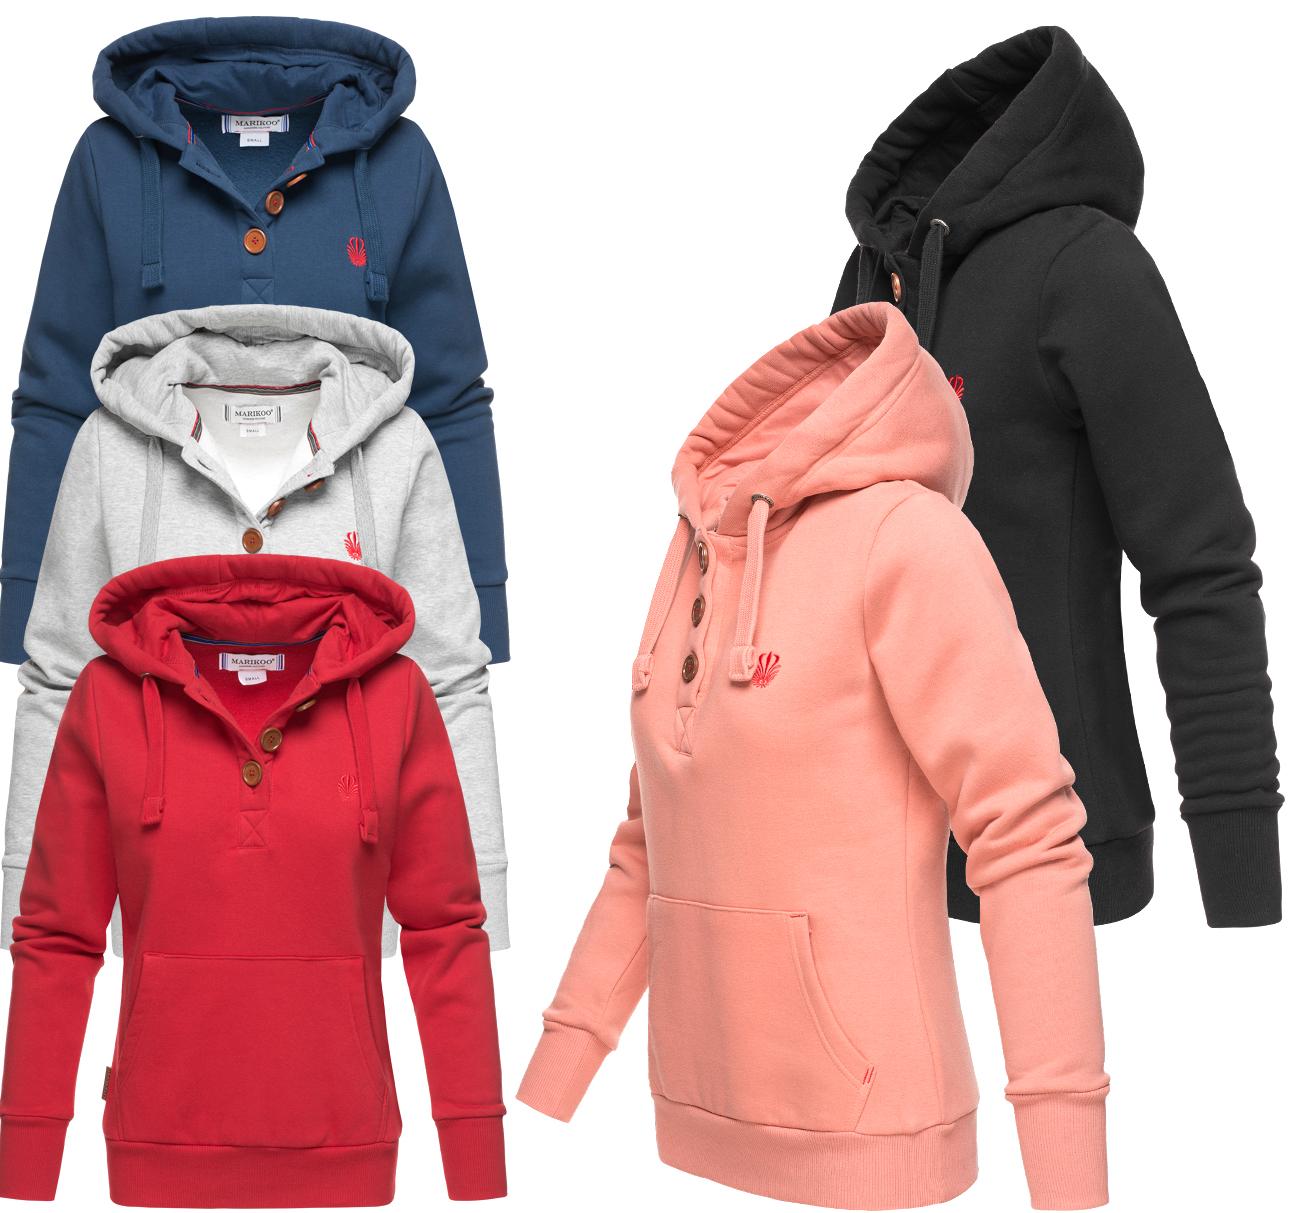 Details zu Marikoo Yuriko Damen Hoodie Sweatjacke Sweatshirt Pullover Sweater Kapuzenpulli